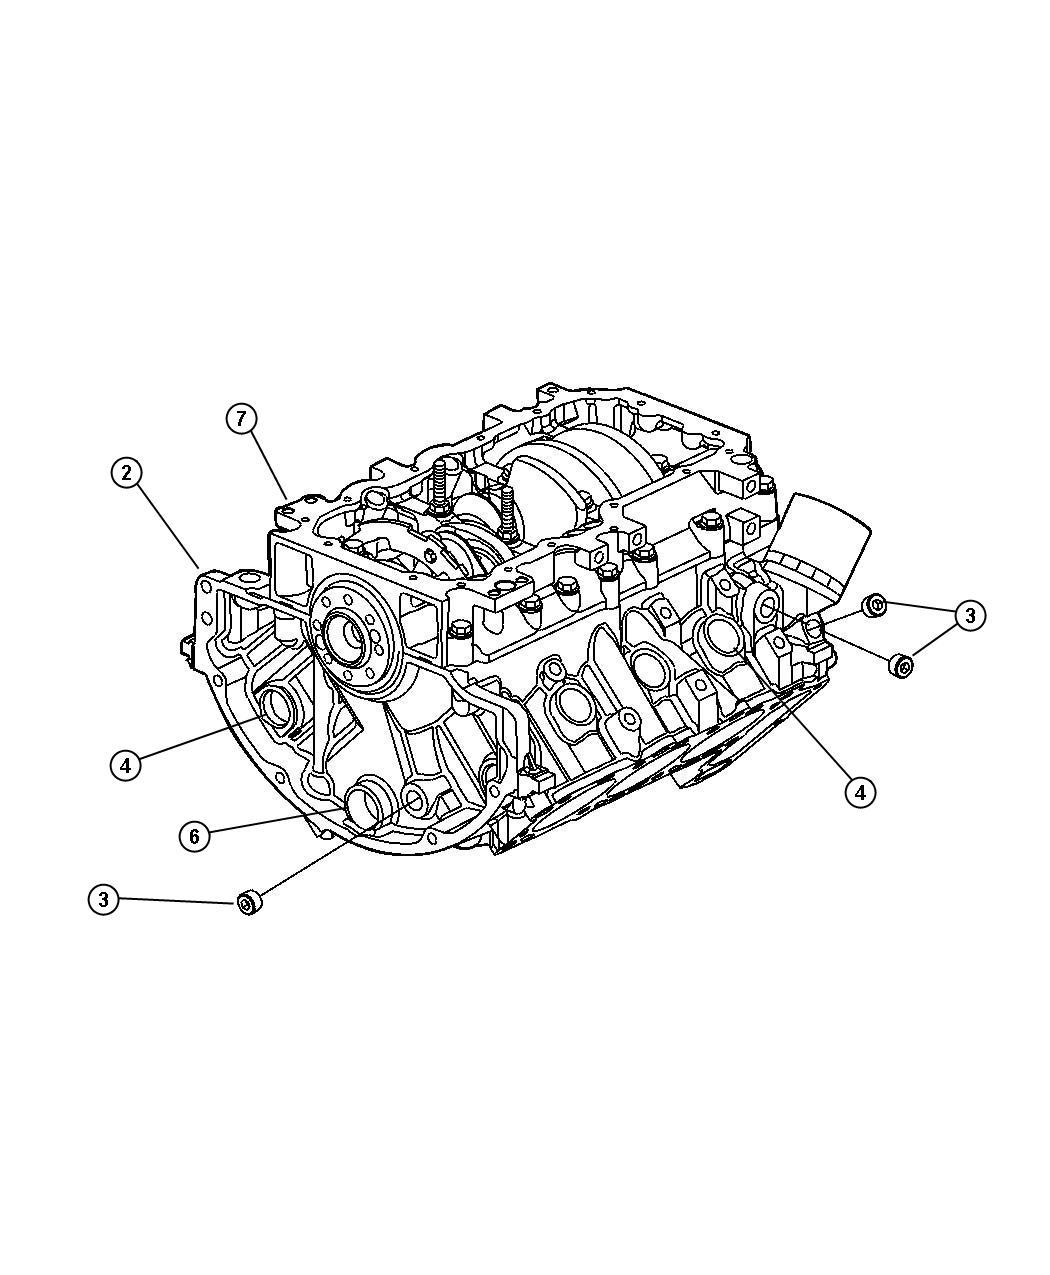 Dodge Avenger Block Short Engine Torque